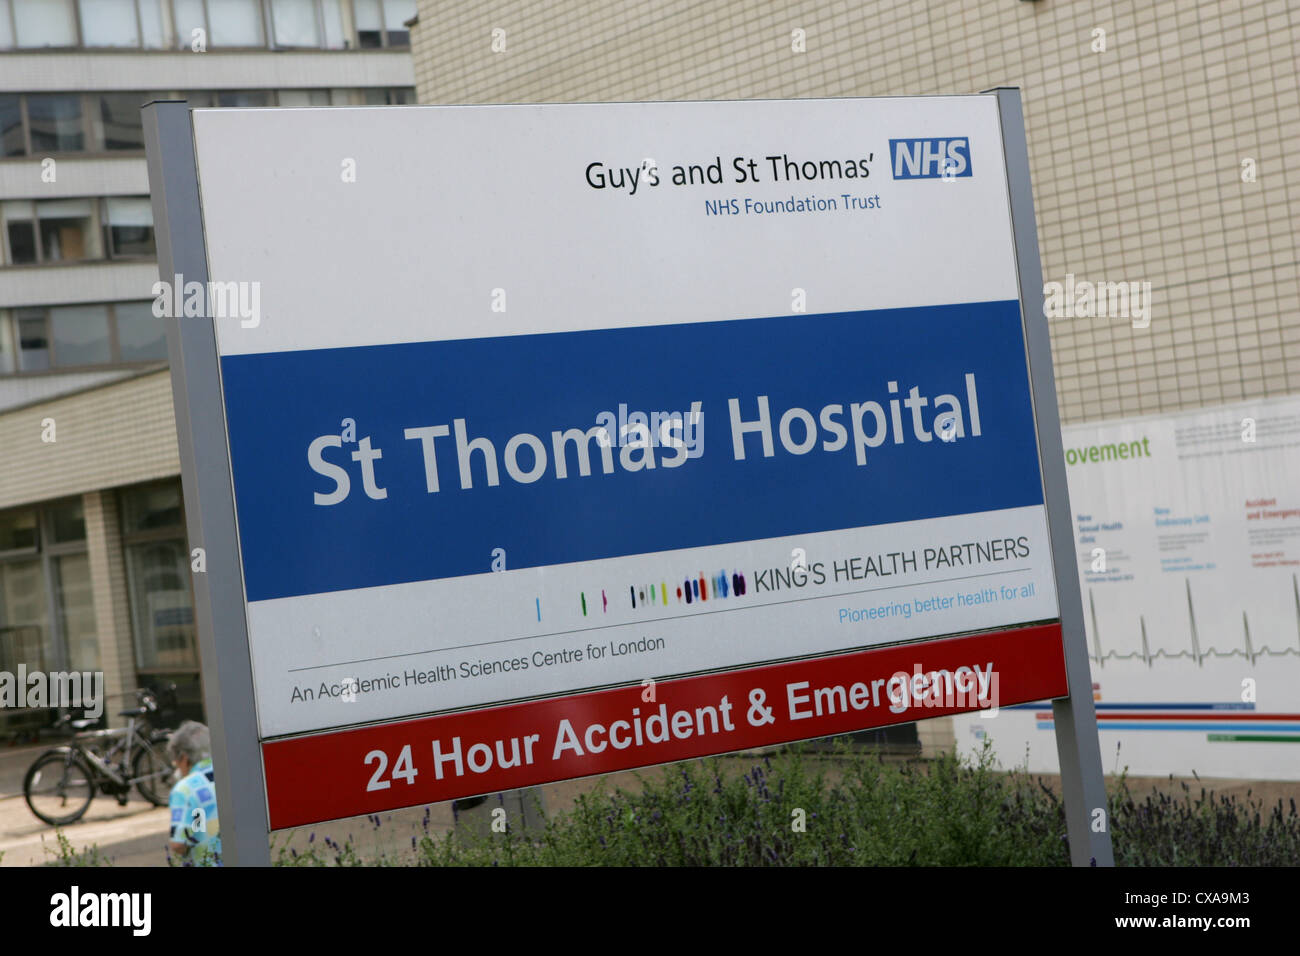 Guy's and St Thamas' NHS Hospital - London July 2012 - Stock Image